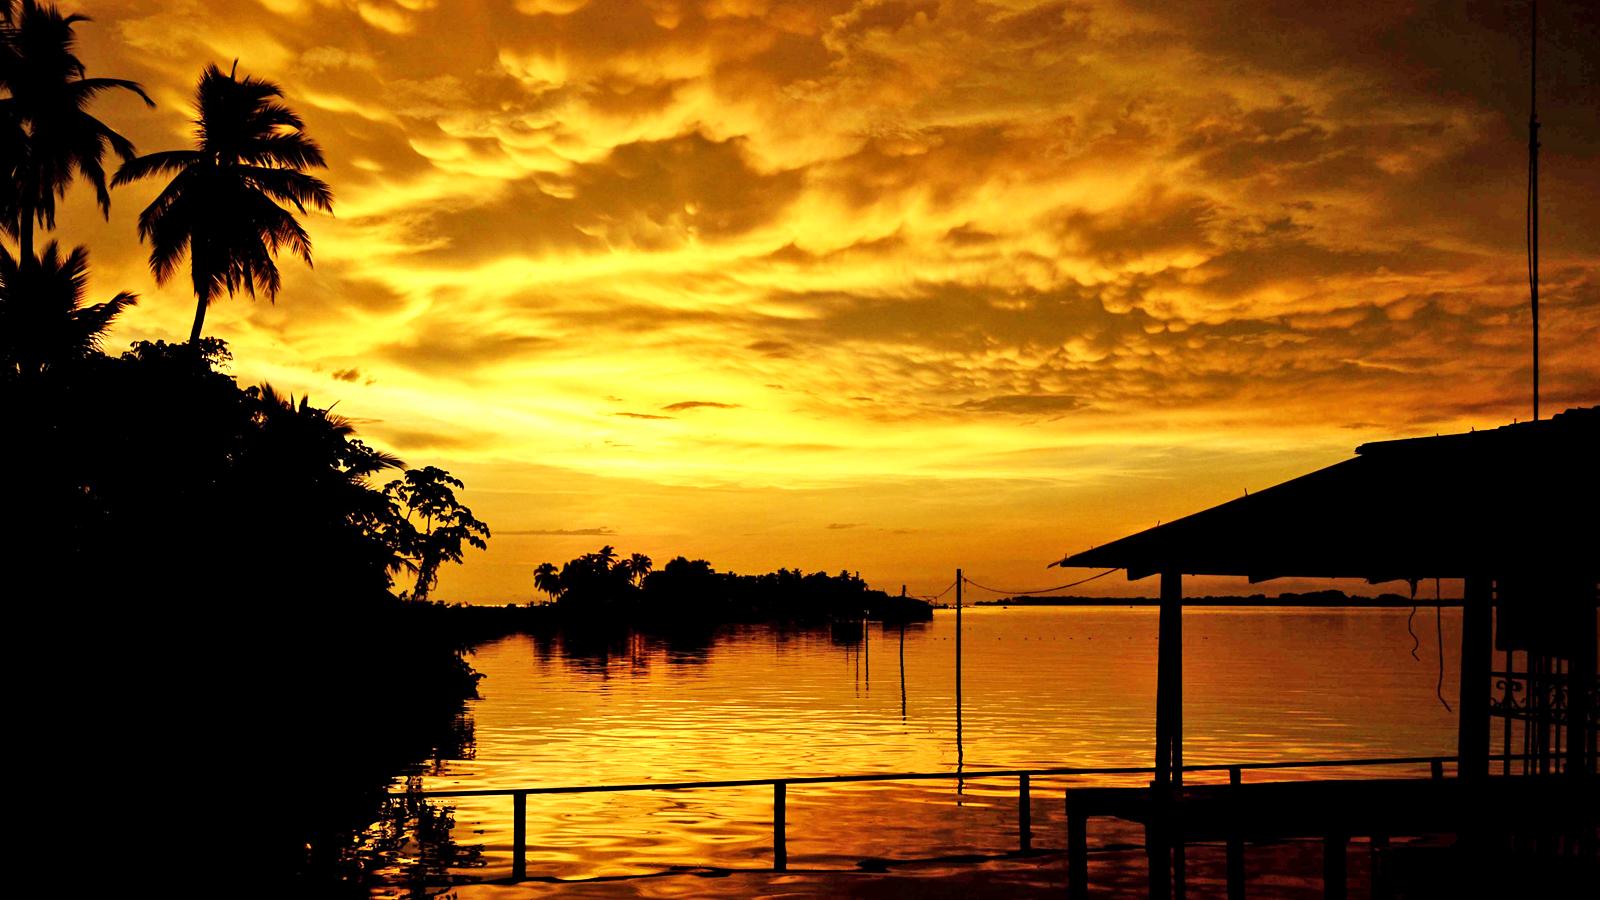 Maracaibo See in Venezuela. Bundesstaat Zulia mit Catatumbo Delta und Wetterleuchten traveljunkies